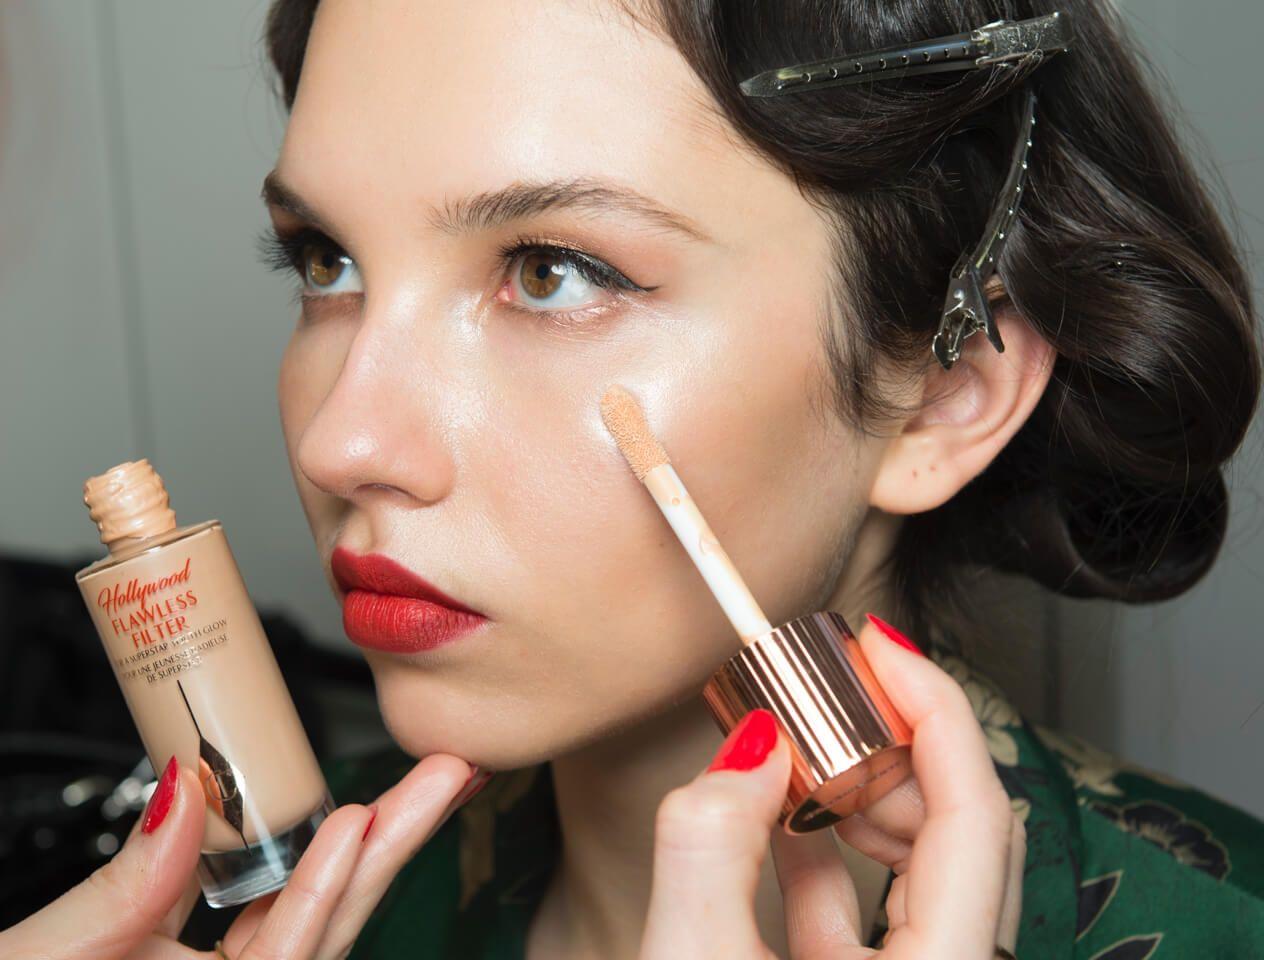 Charlotte Tilbury applying model's makeup backstage at Alice Temperley LFW